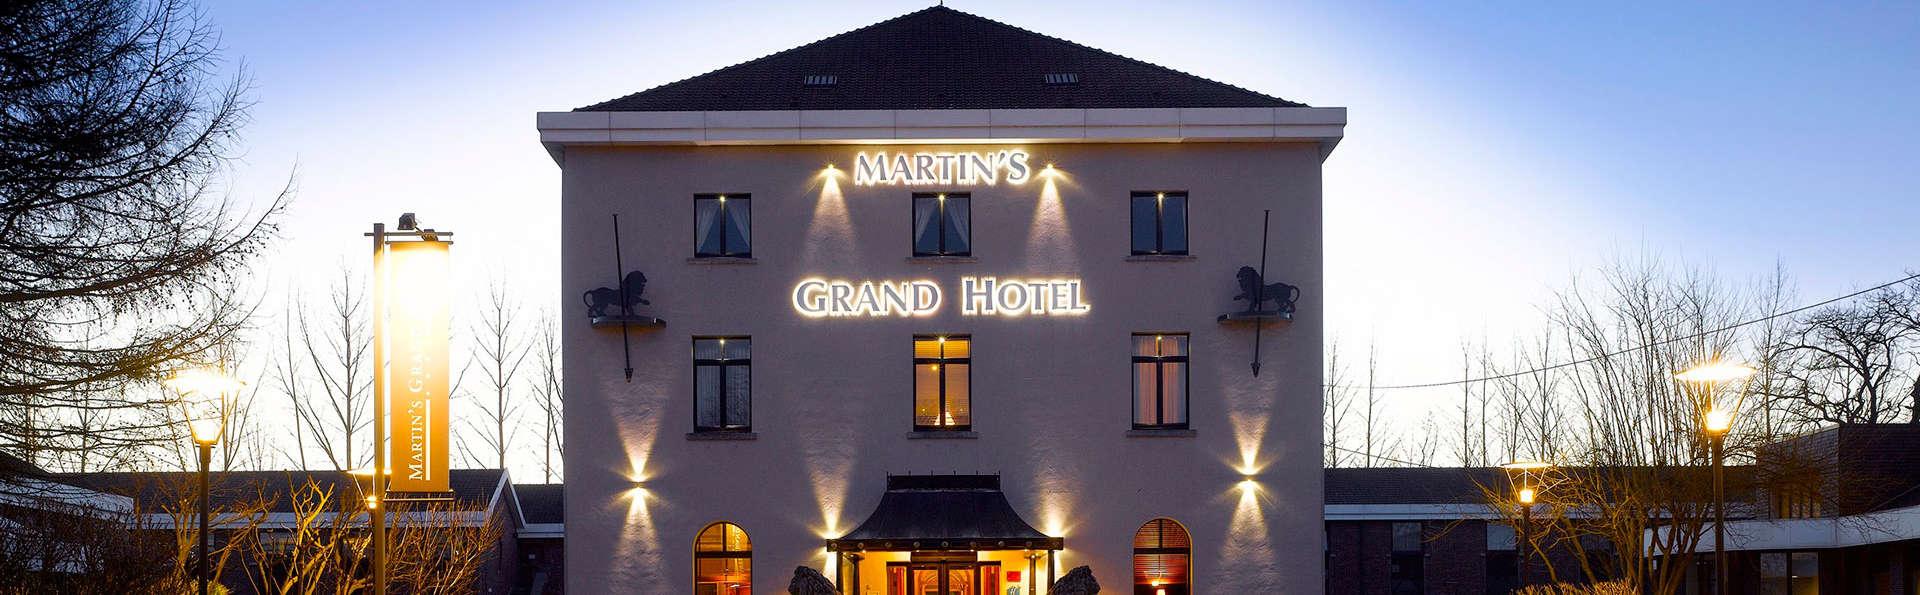 Martin's Grand Hotel - edit_front2.jpg